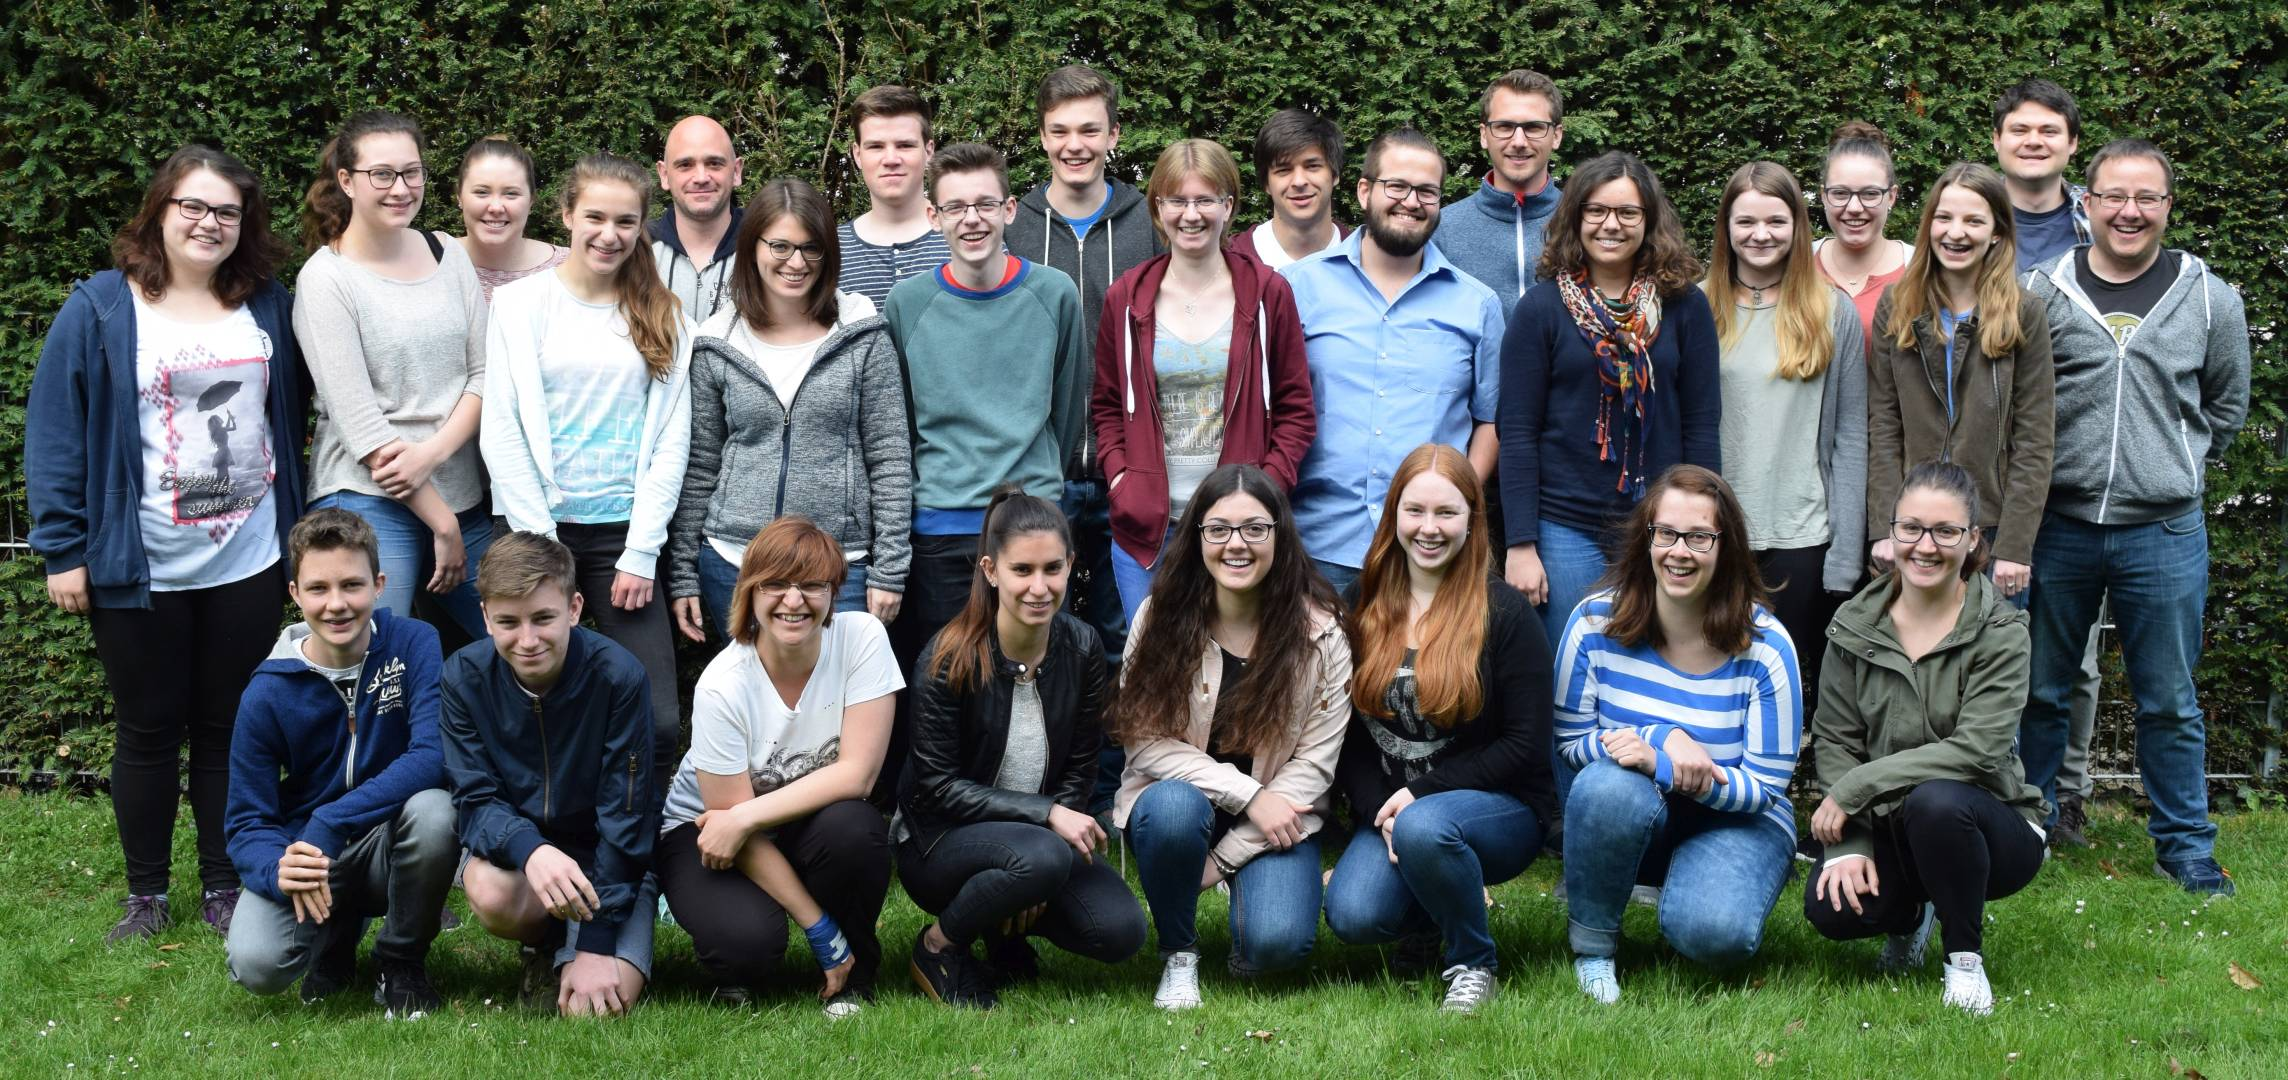 Gruppenfoto des Jugendleiter-Basismoduls 2017